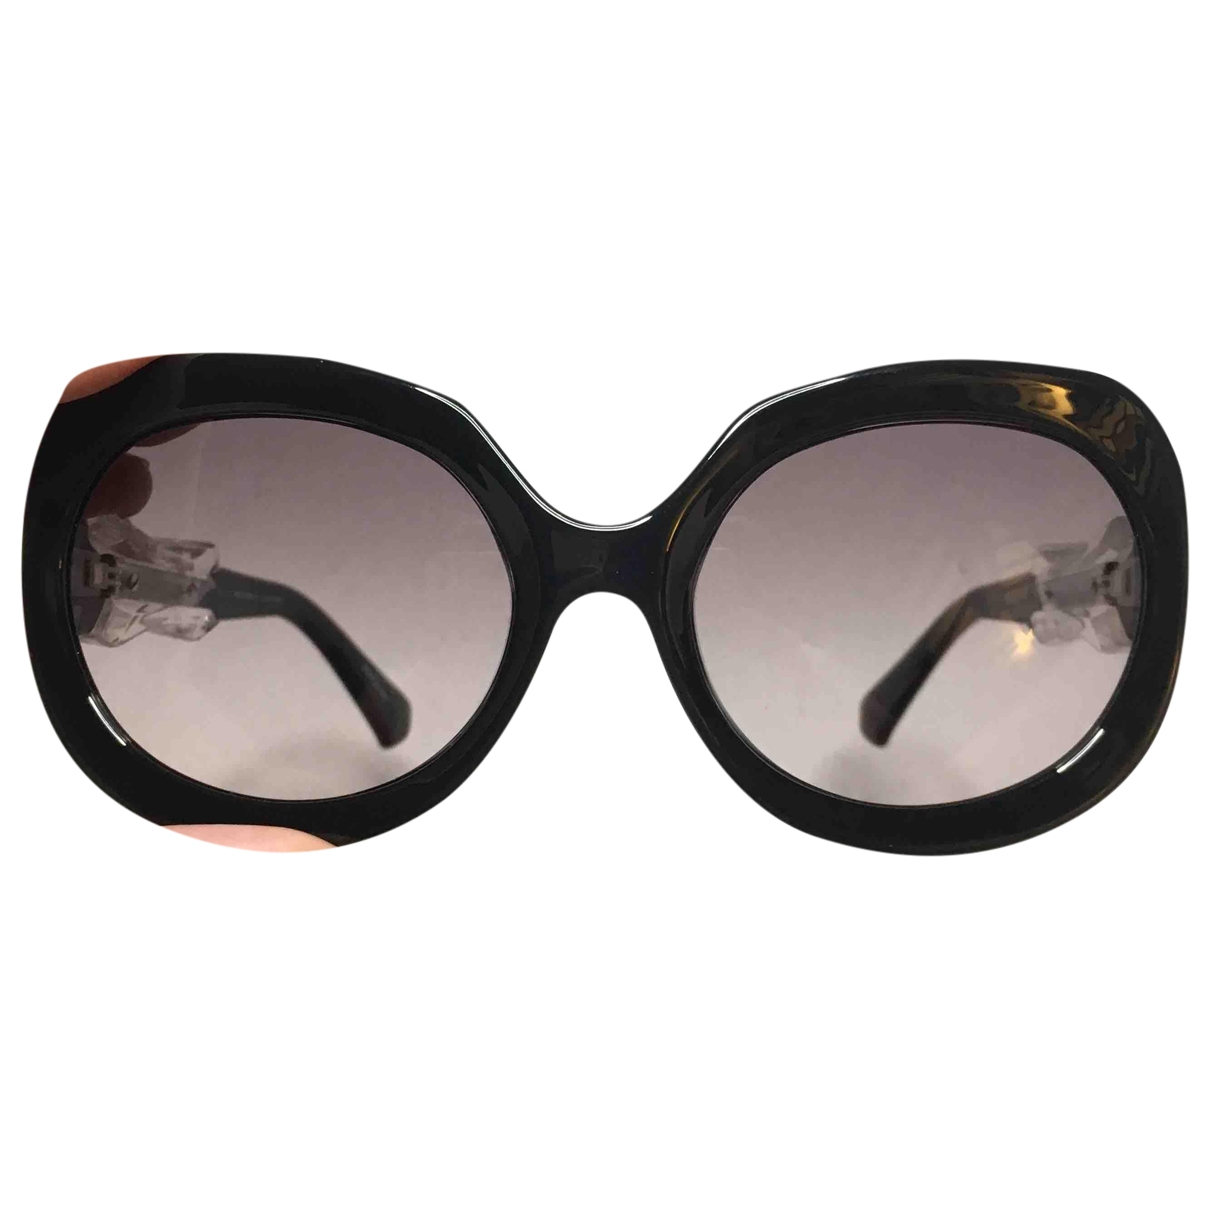 Emilio Pucci \N Black Sunglasses for Women \N